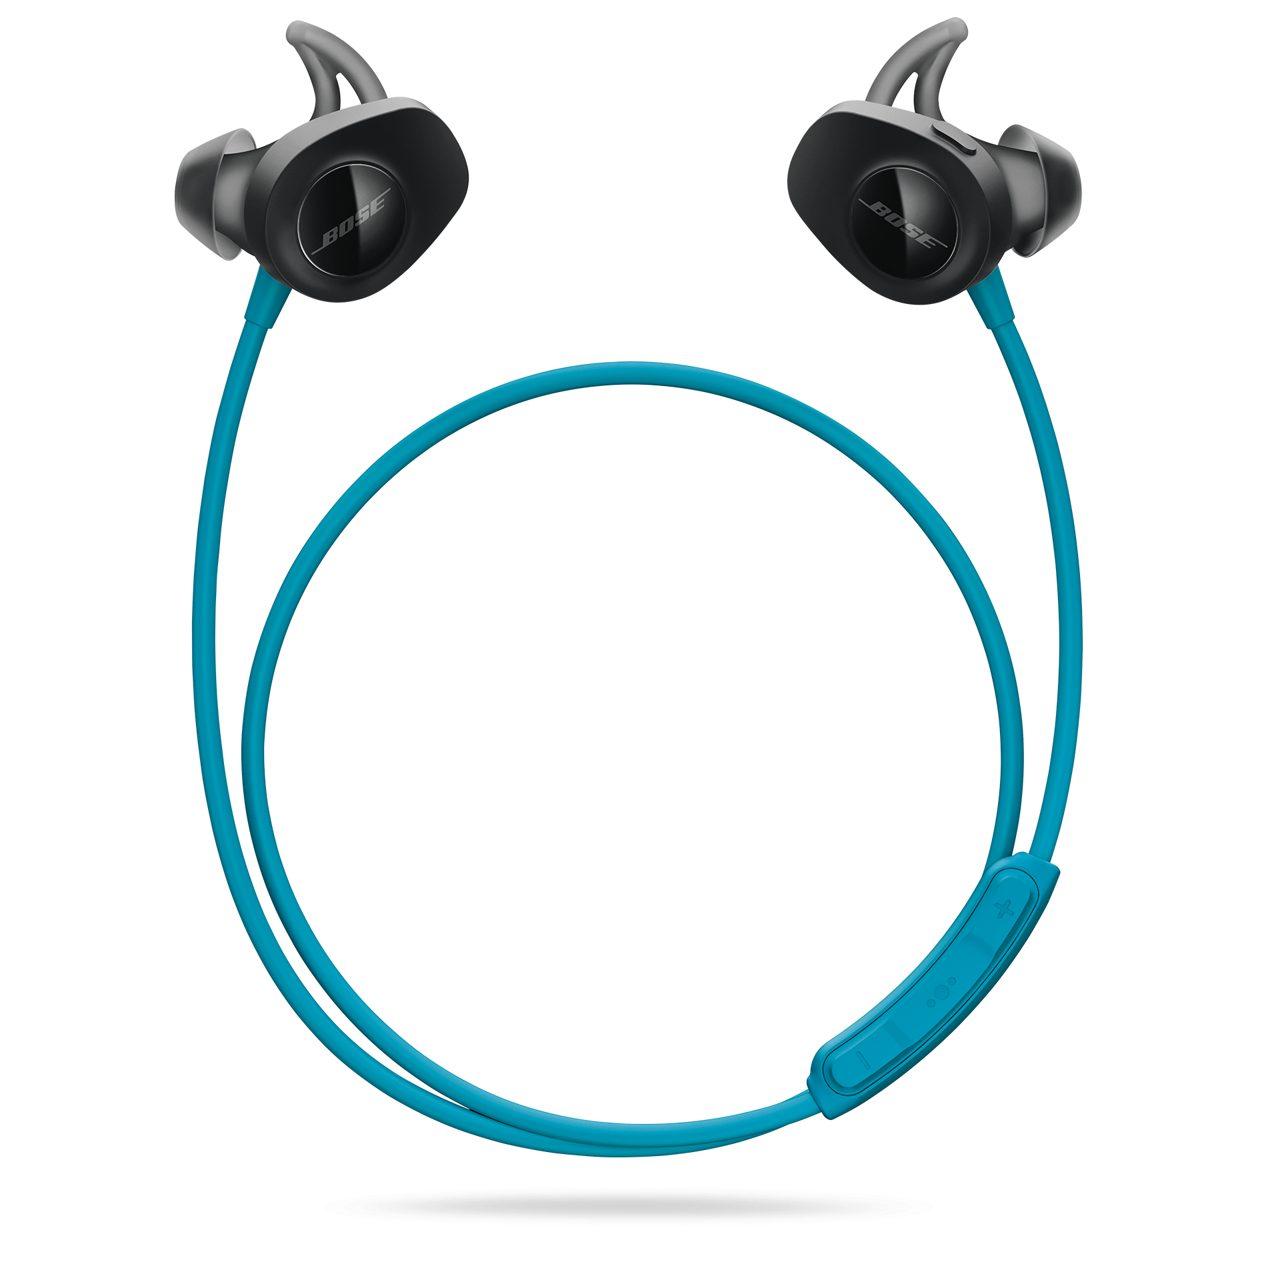 Bose Soundsport HDPHN Wireless Bluetooth Headset